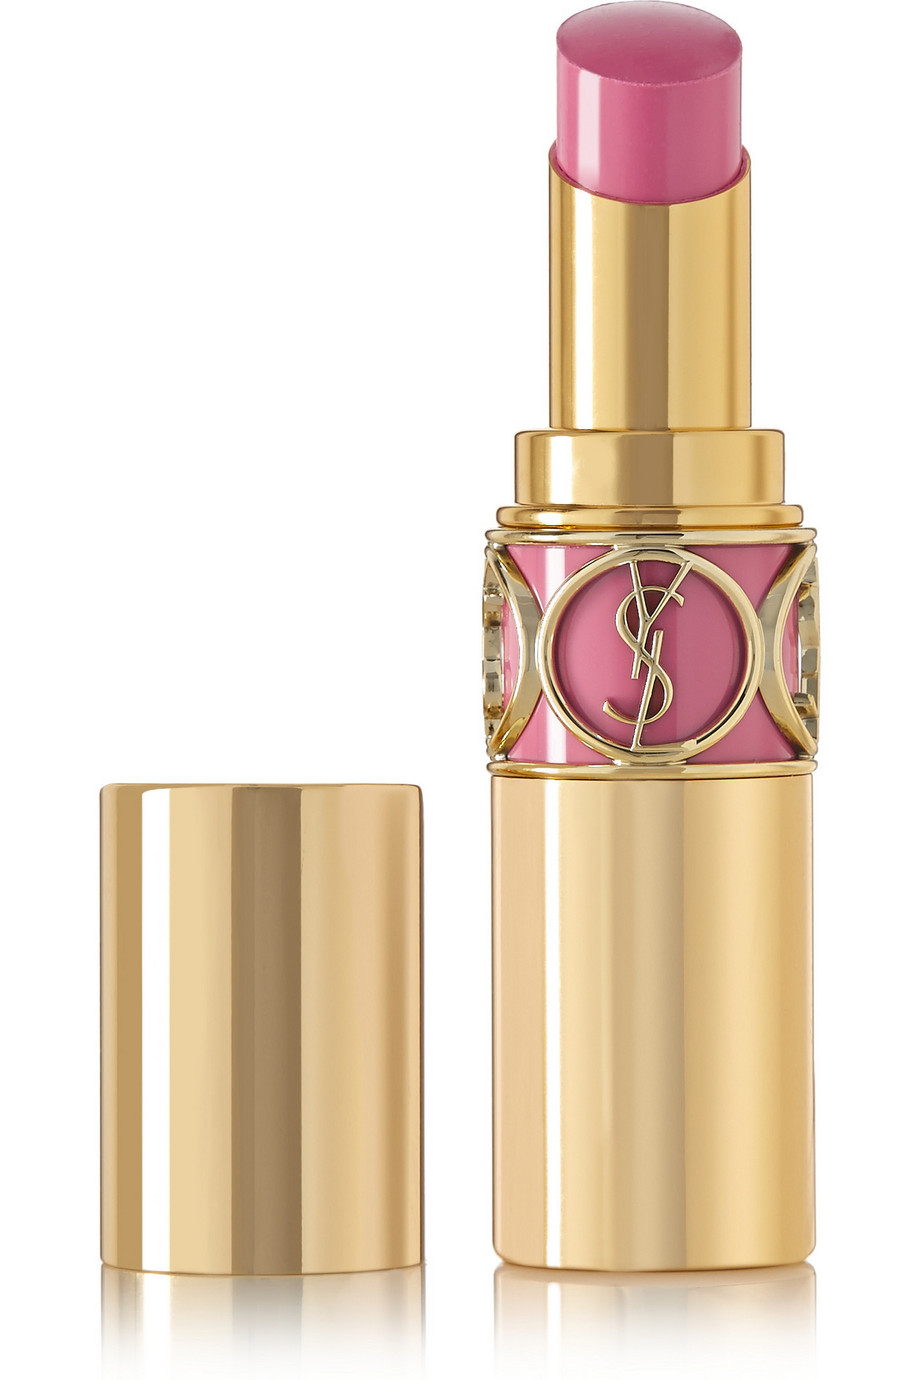 Rouge Volupté Radiant Lipstick - 8 Fetish Pink, by Yves Saint Laurent Beauty